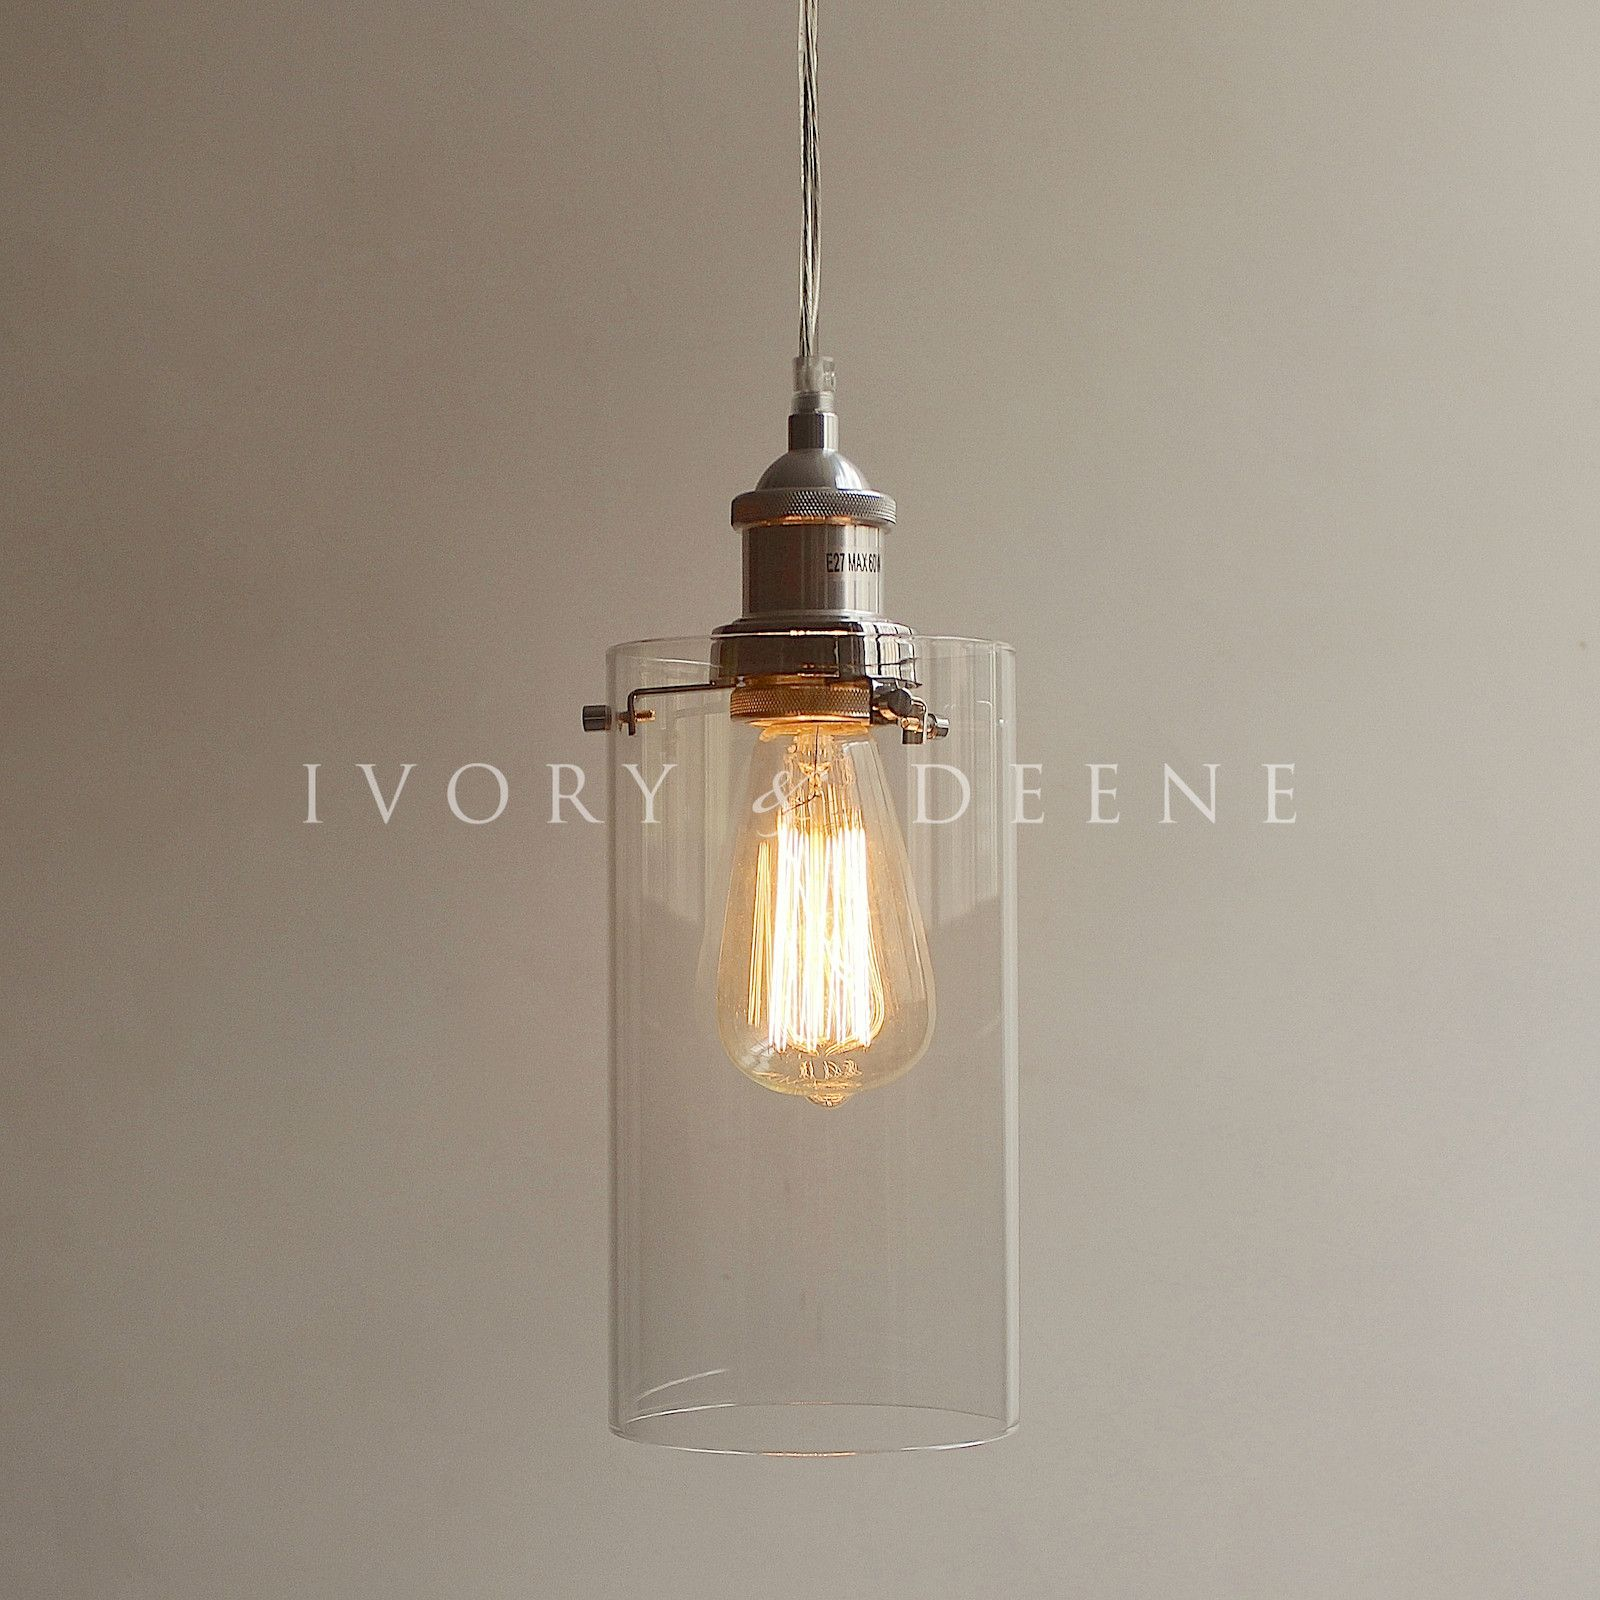 clear glass pendant lighting. Allira Pendant Light Clear Glass Chrome Fittings Lighting A